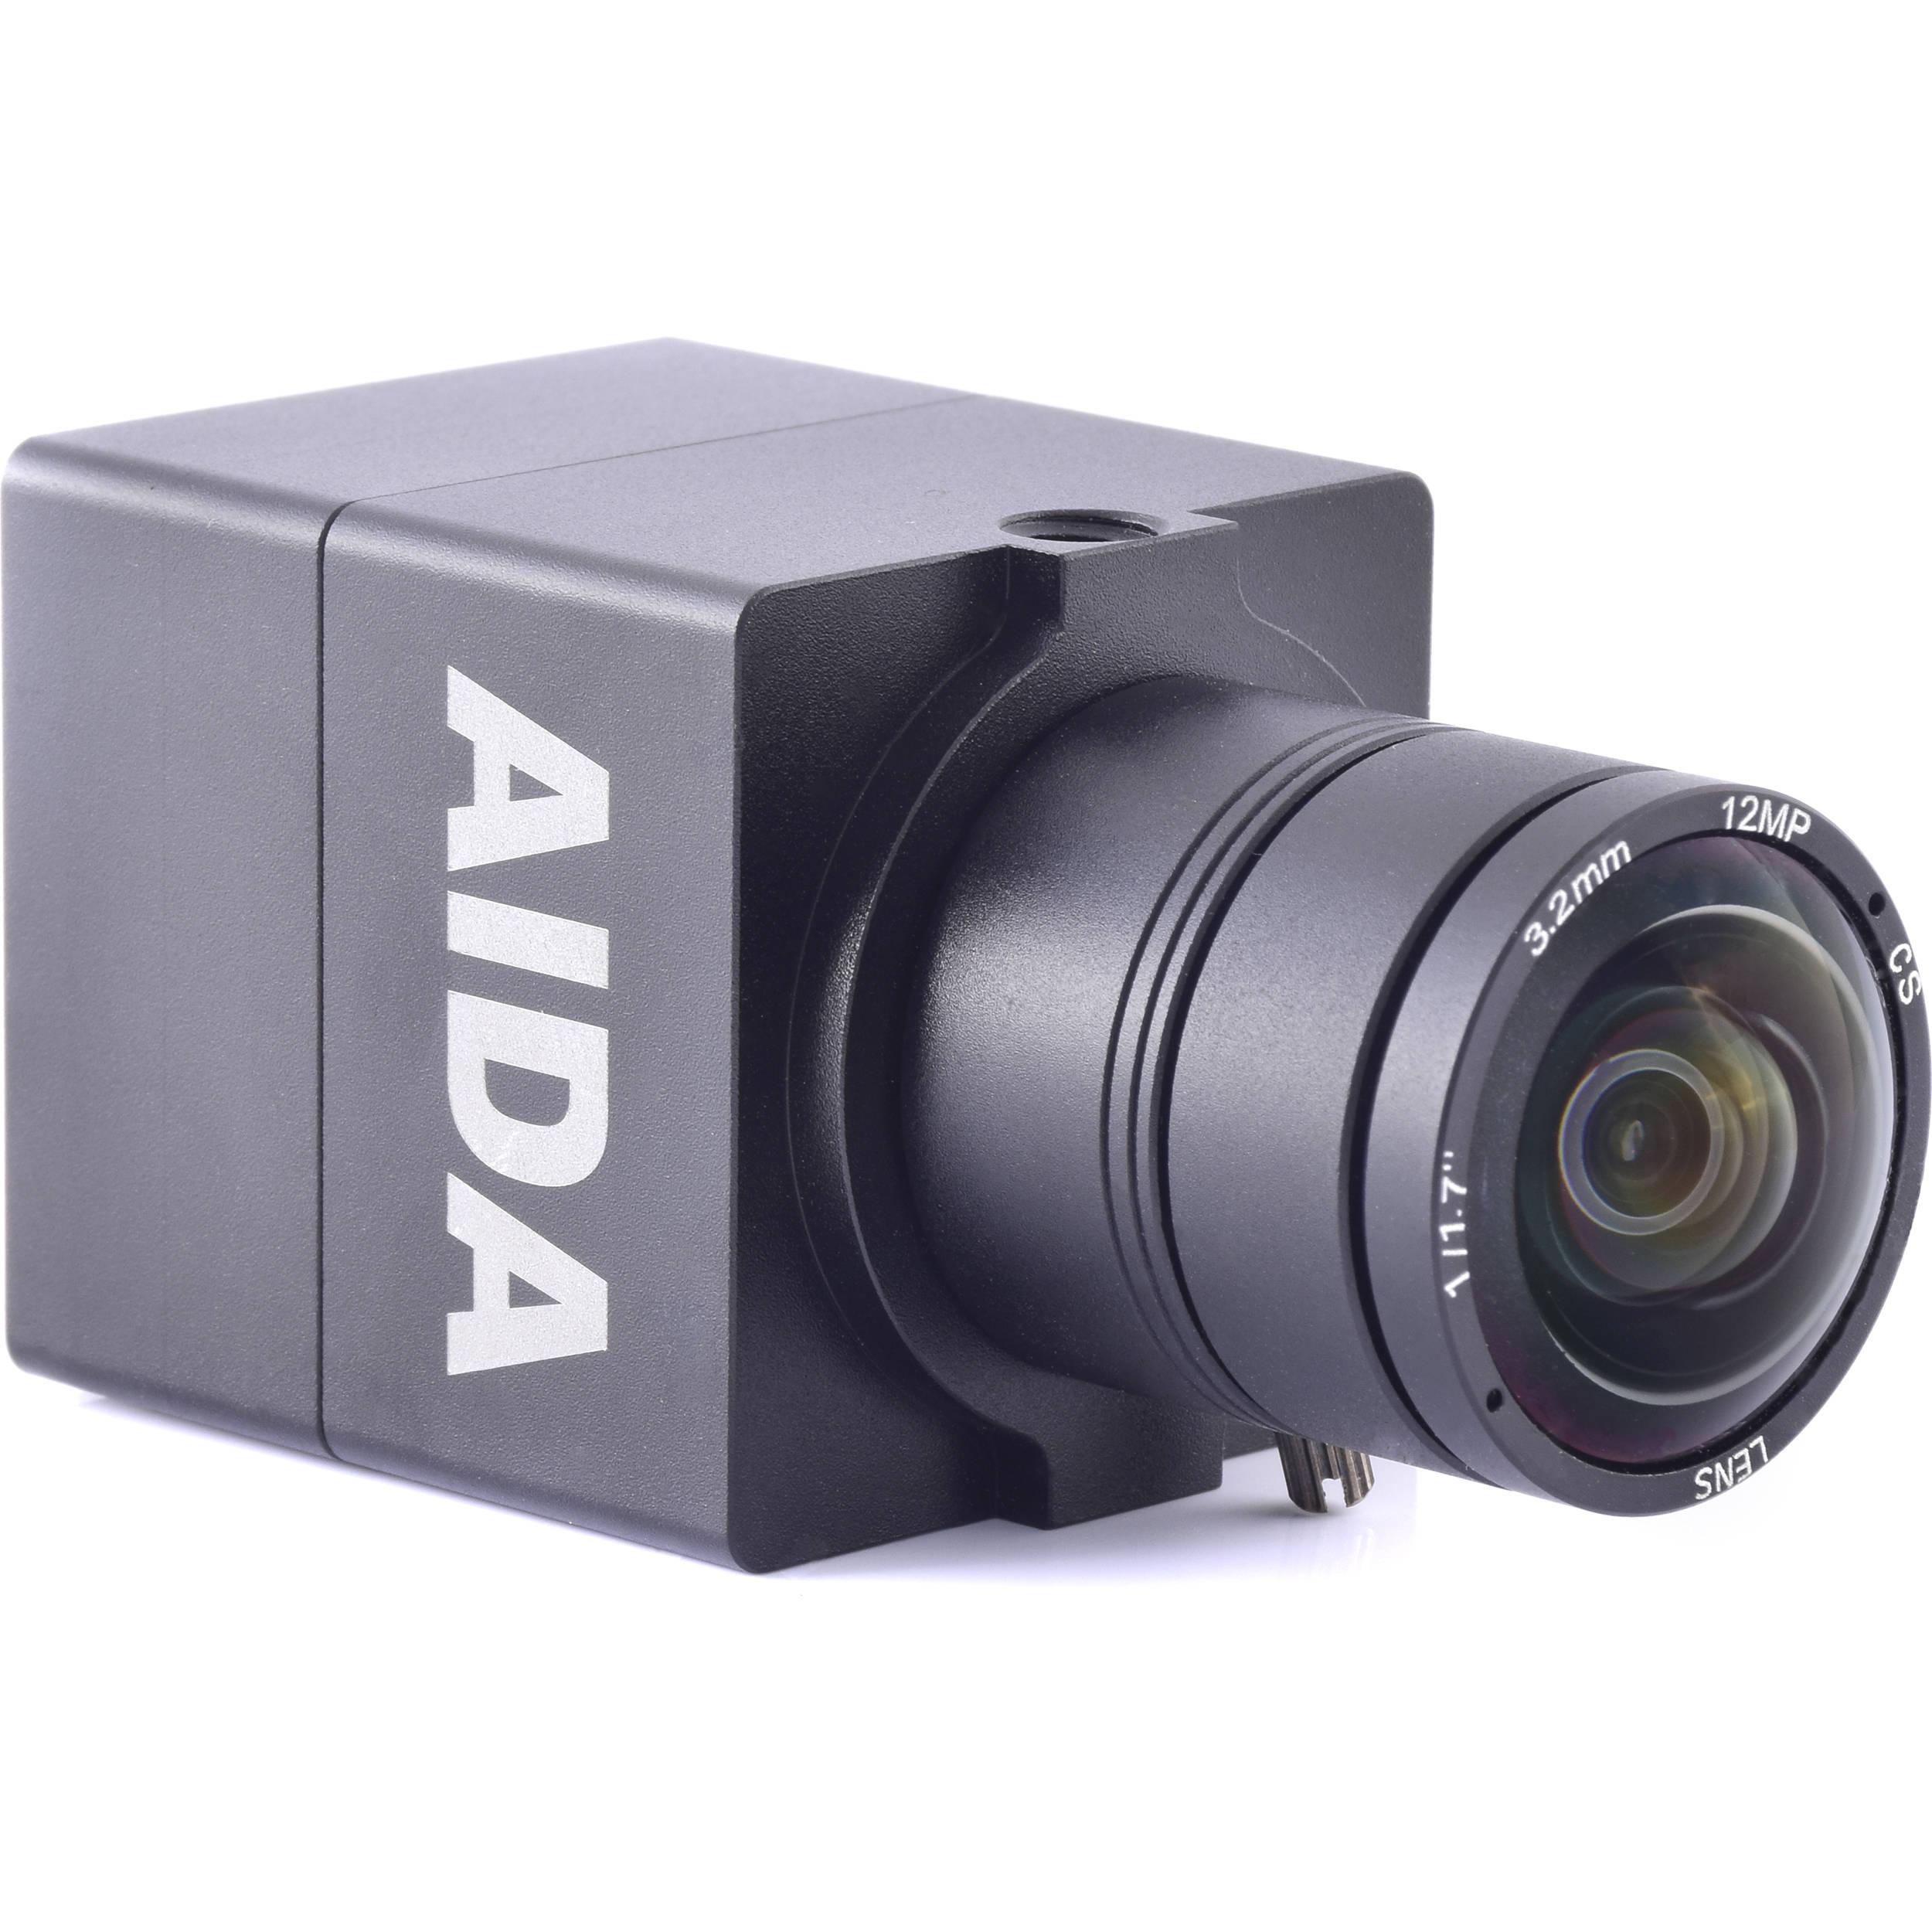 AIDA Imaging UHD 4K/30 HDMI 1.4 EFP/POV Camera UHD-100 B&H Photo